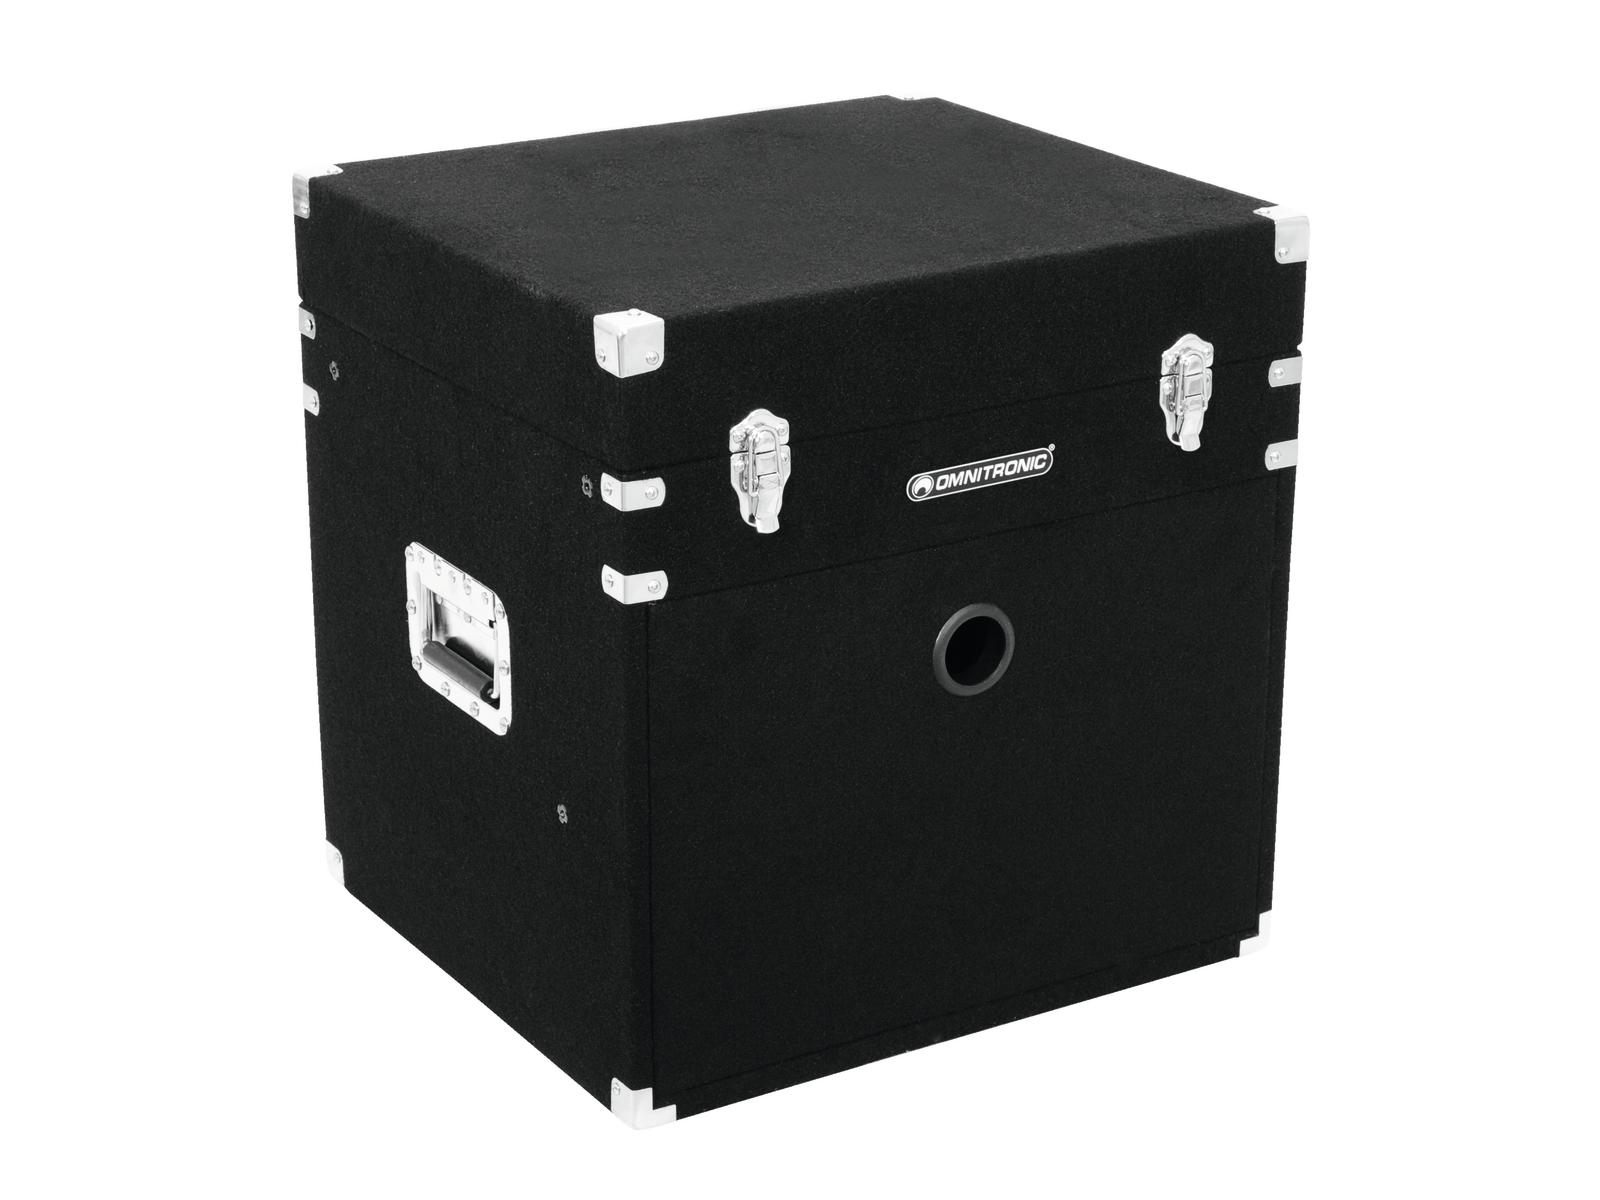 ROADINGER Kombi-Case 8HE Textilbezug schwarz